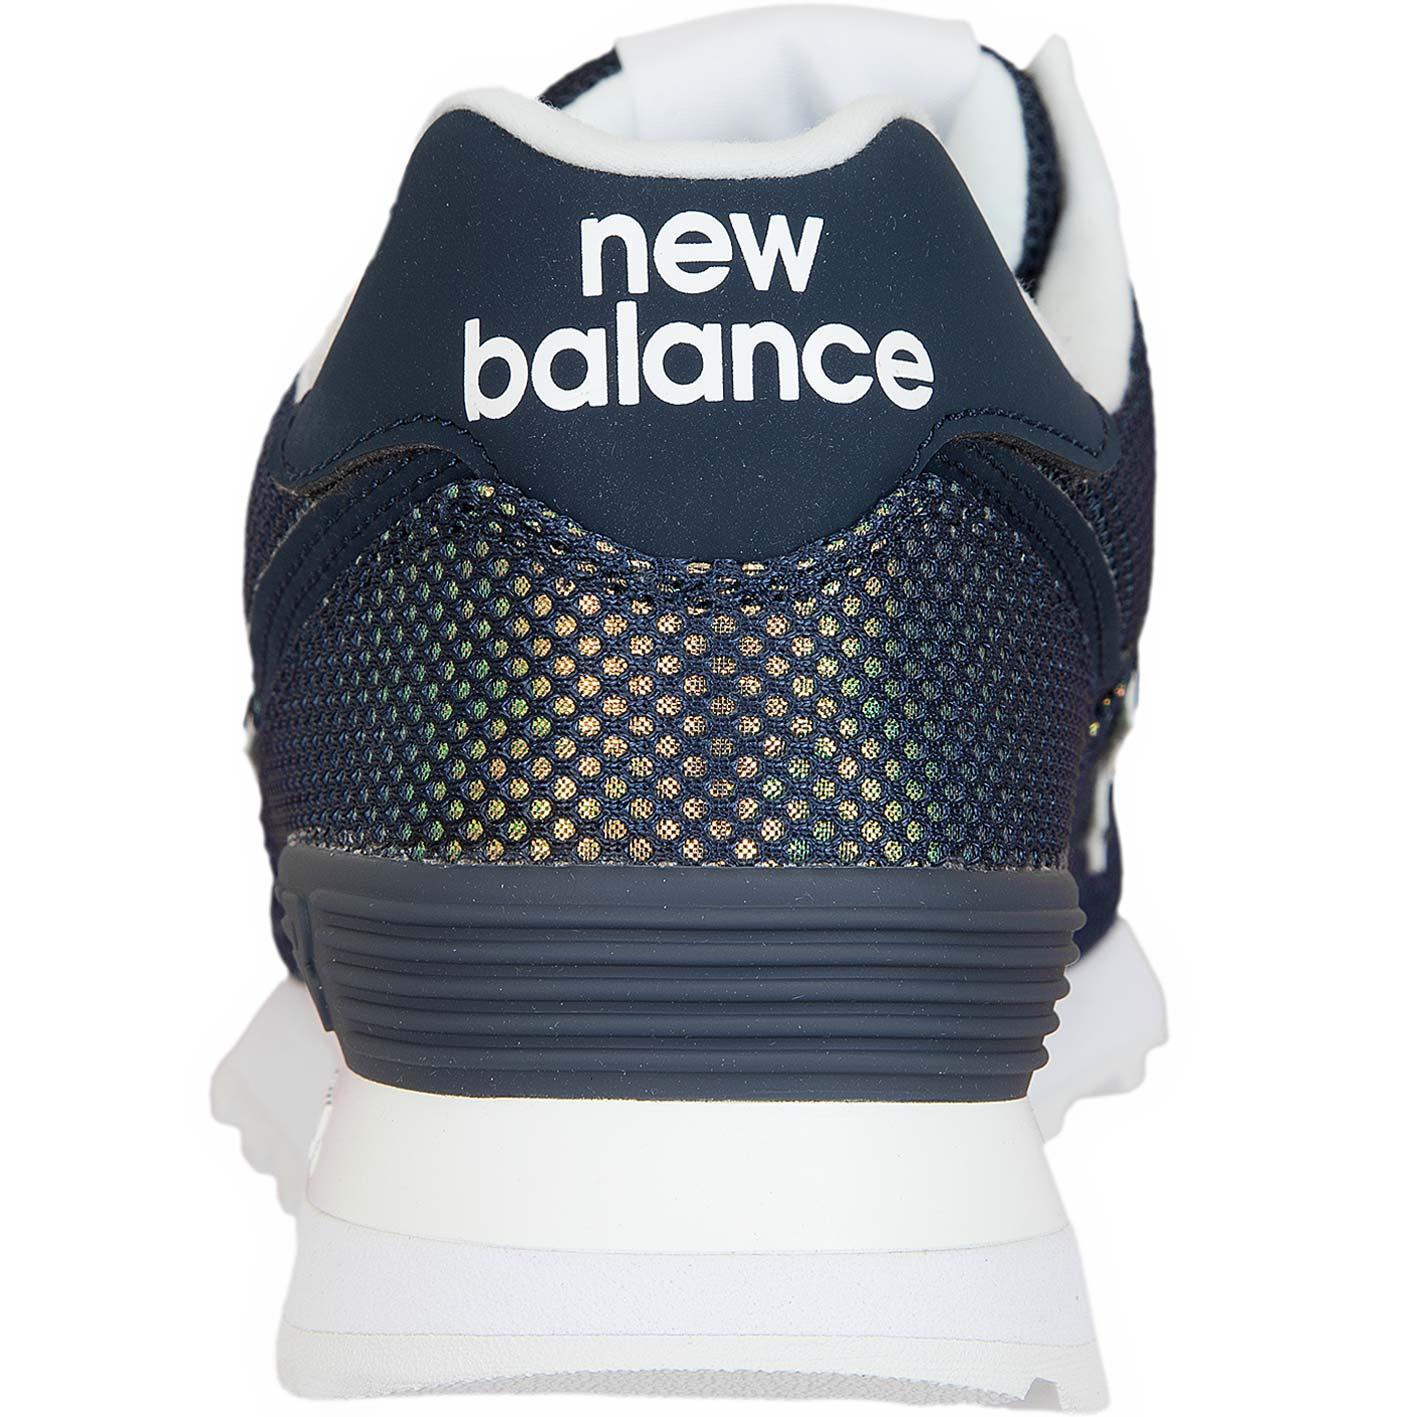 new style fc3d2 d62f5 New Balance Damen Sneaker 574 Textil/Synthetik galaxy dunkelblau